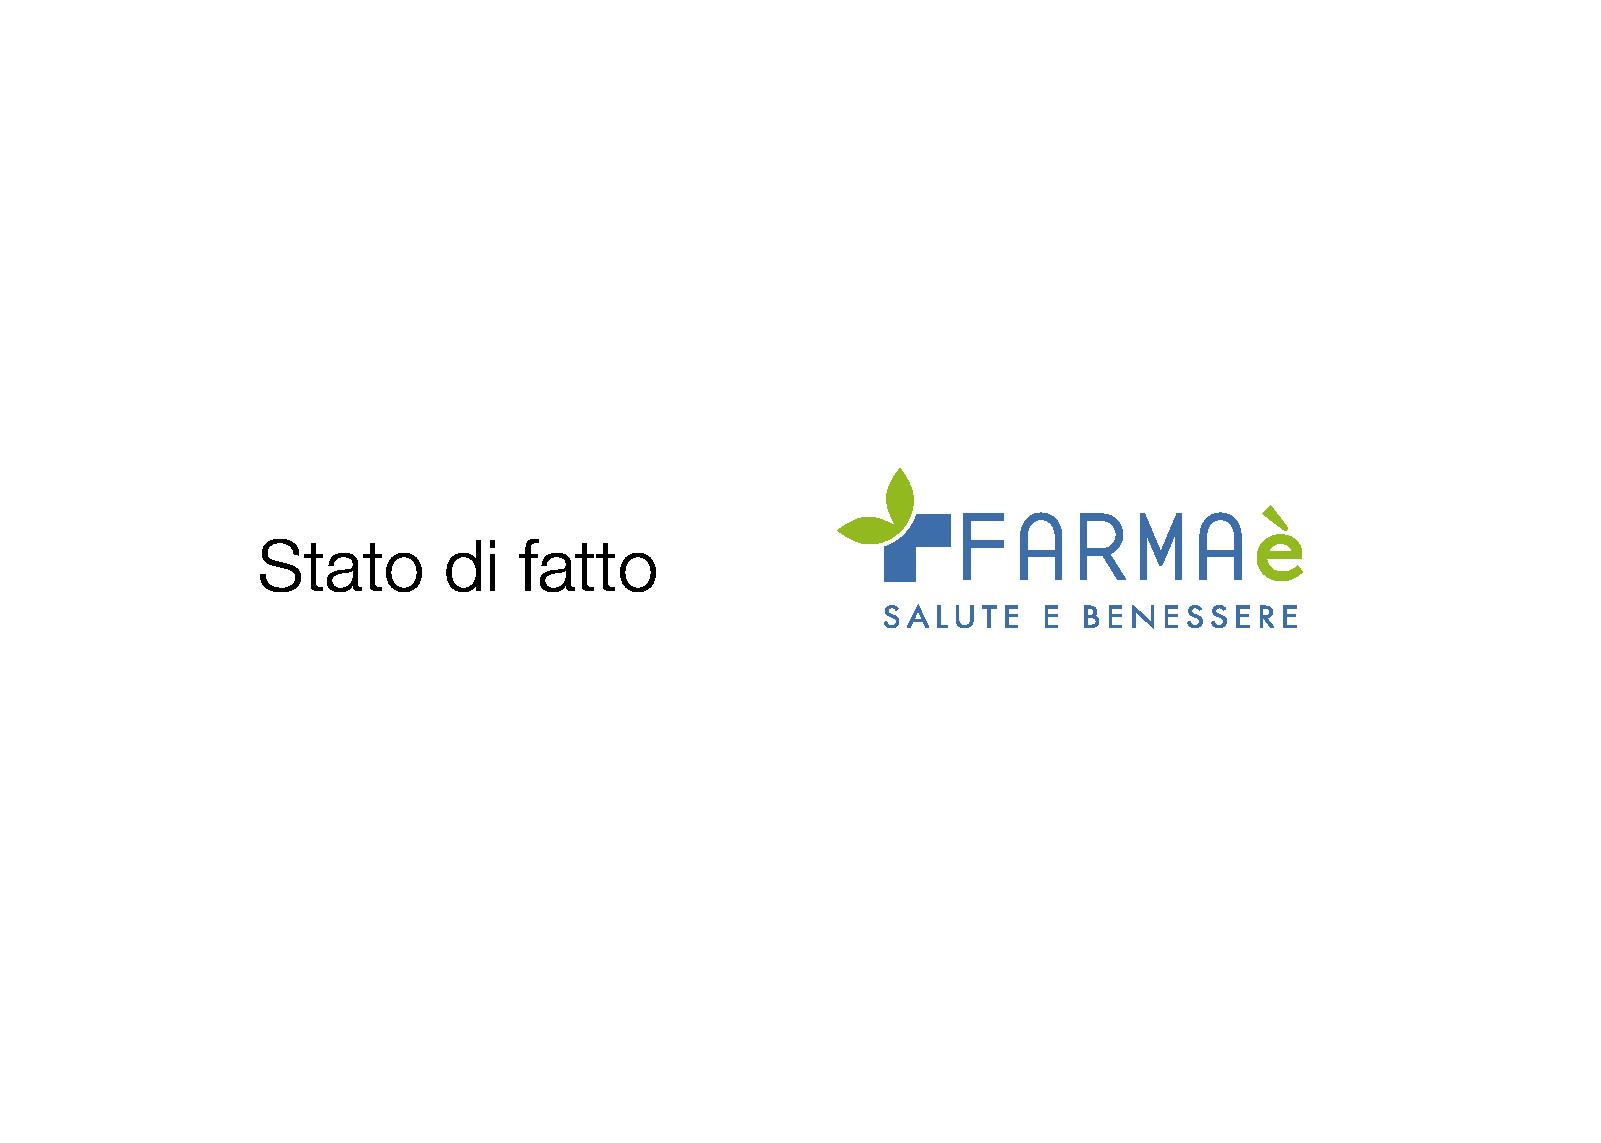 Farmae Salute E Benessere Restyling Logo Badred